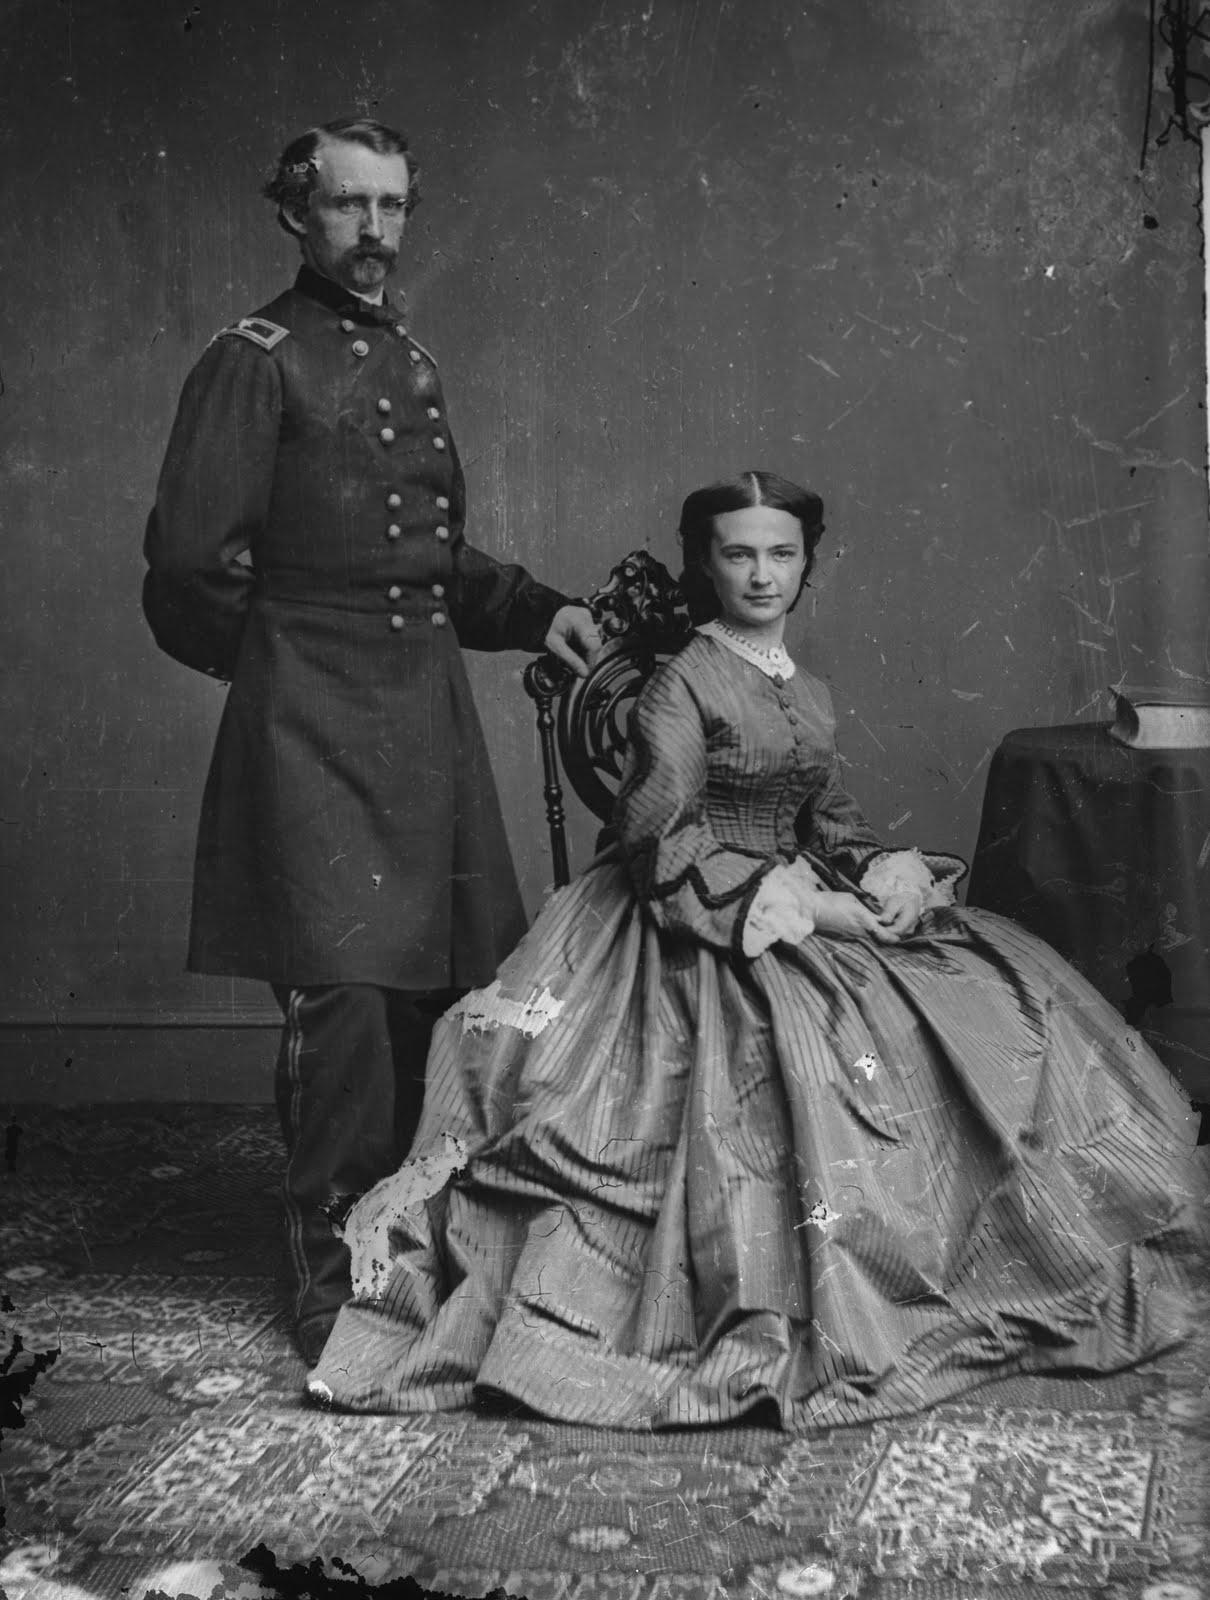 http://2.bp.blogspot.com/_5UVRO6TgGqA/TF8e3lDOJLI/AAAAAAAAAdU/94XwKM3NHdo/s1600/George_Armstrong_Custer_and_Elizabeth_Bacon_Custer_-_Brady-Handy.jpg